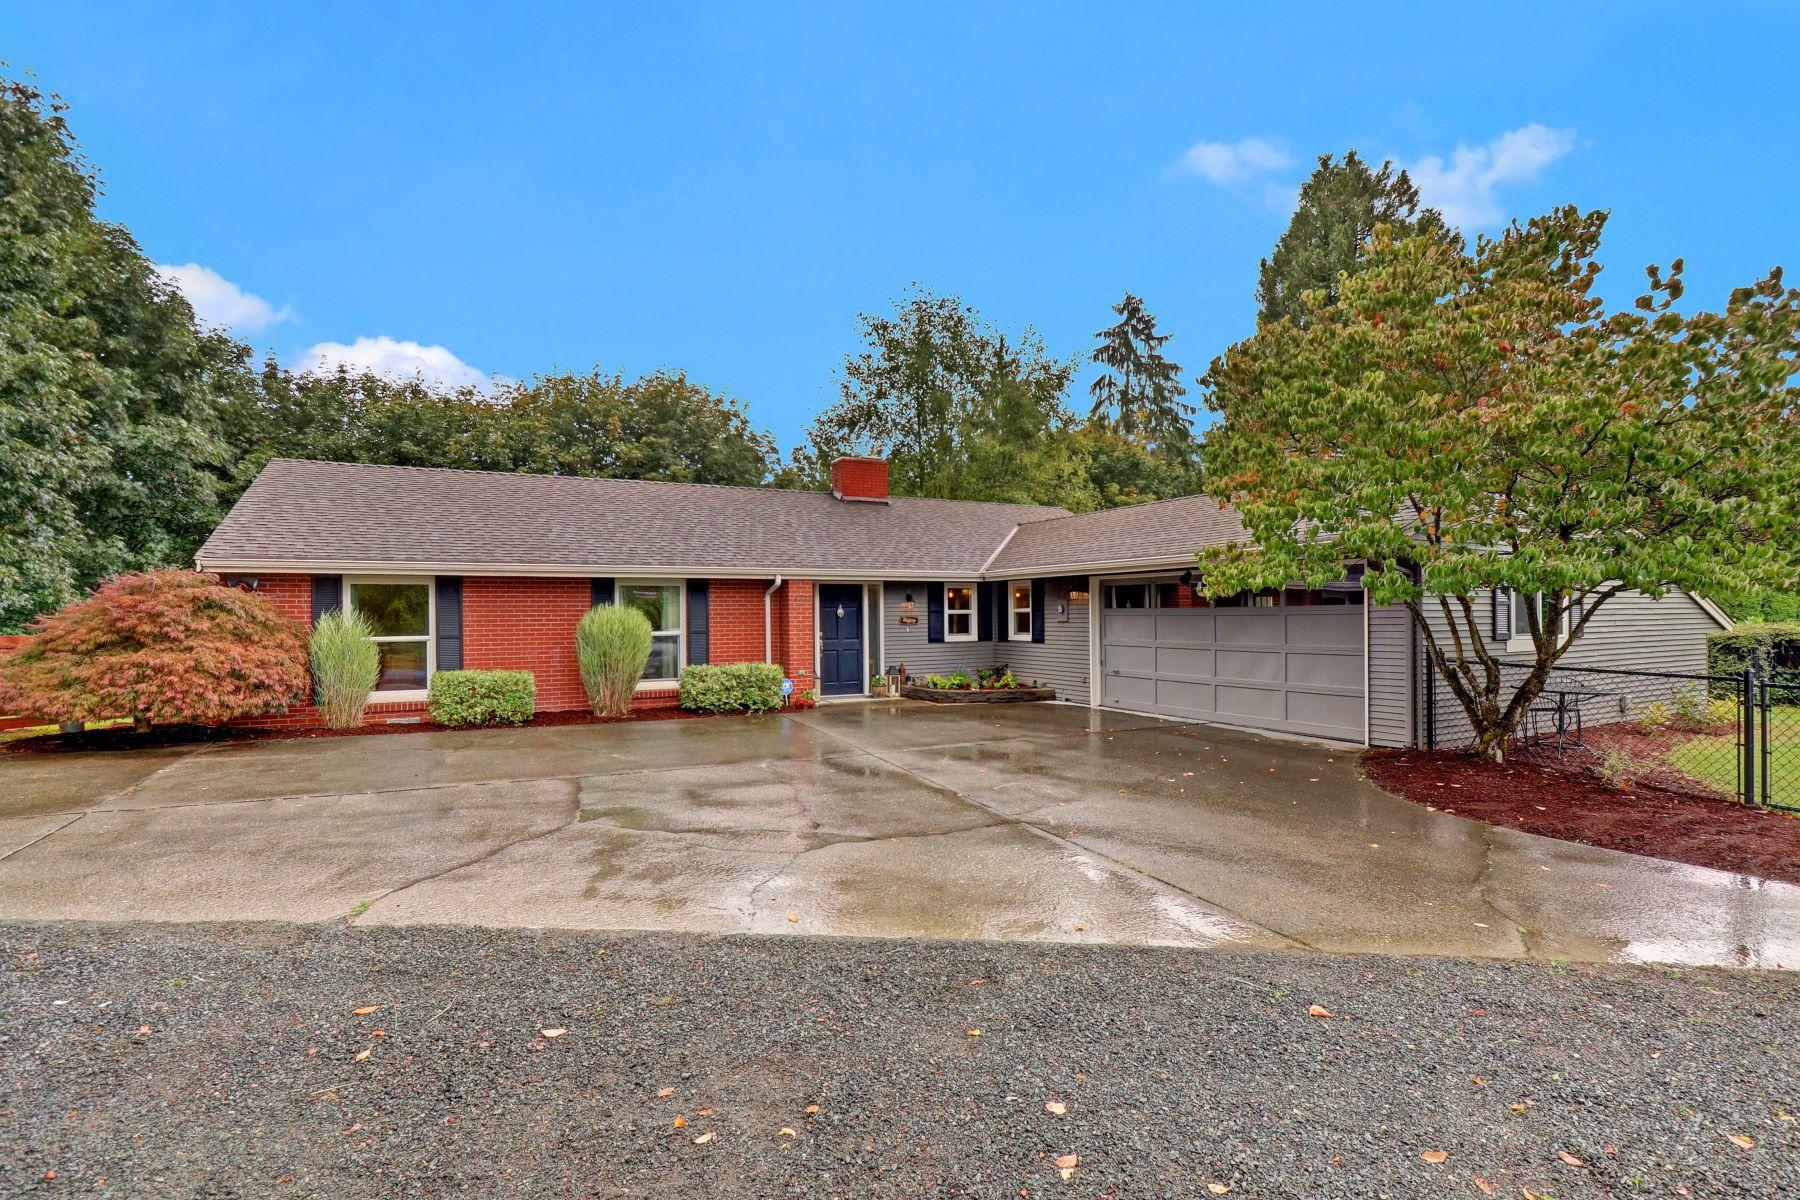 Single Family Homes por un Venta en 14225 Kenwanda Drive, Snohomish, WA 98296 14225 Kenwanda Dr Snohomish, Washington 98296 Estados Unidos